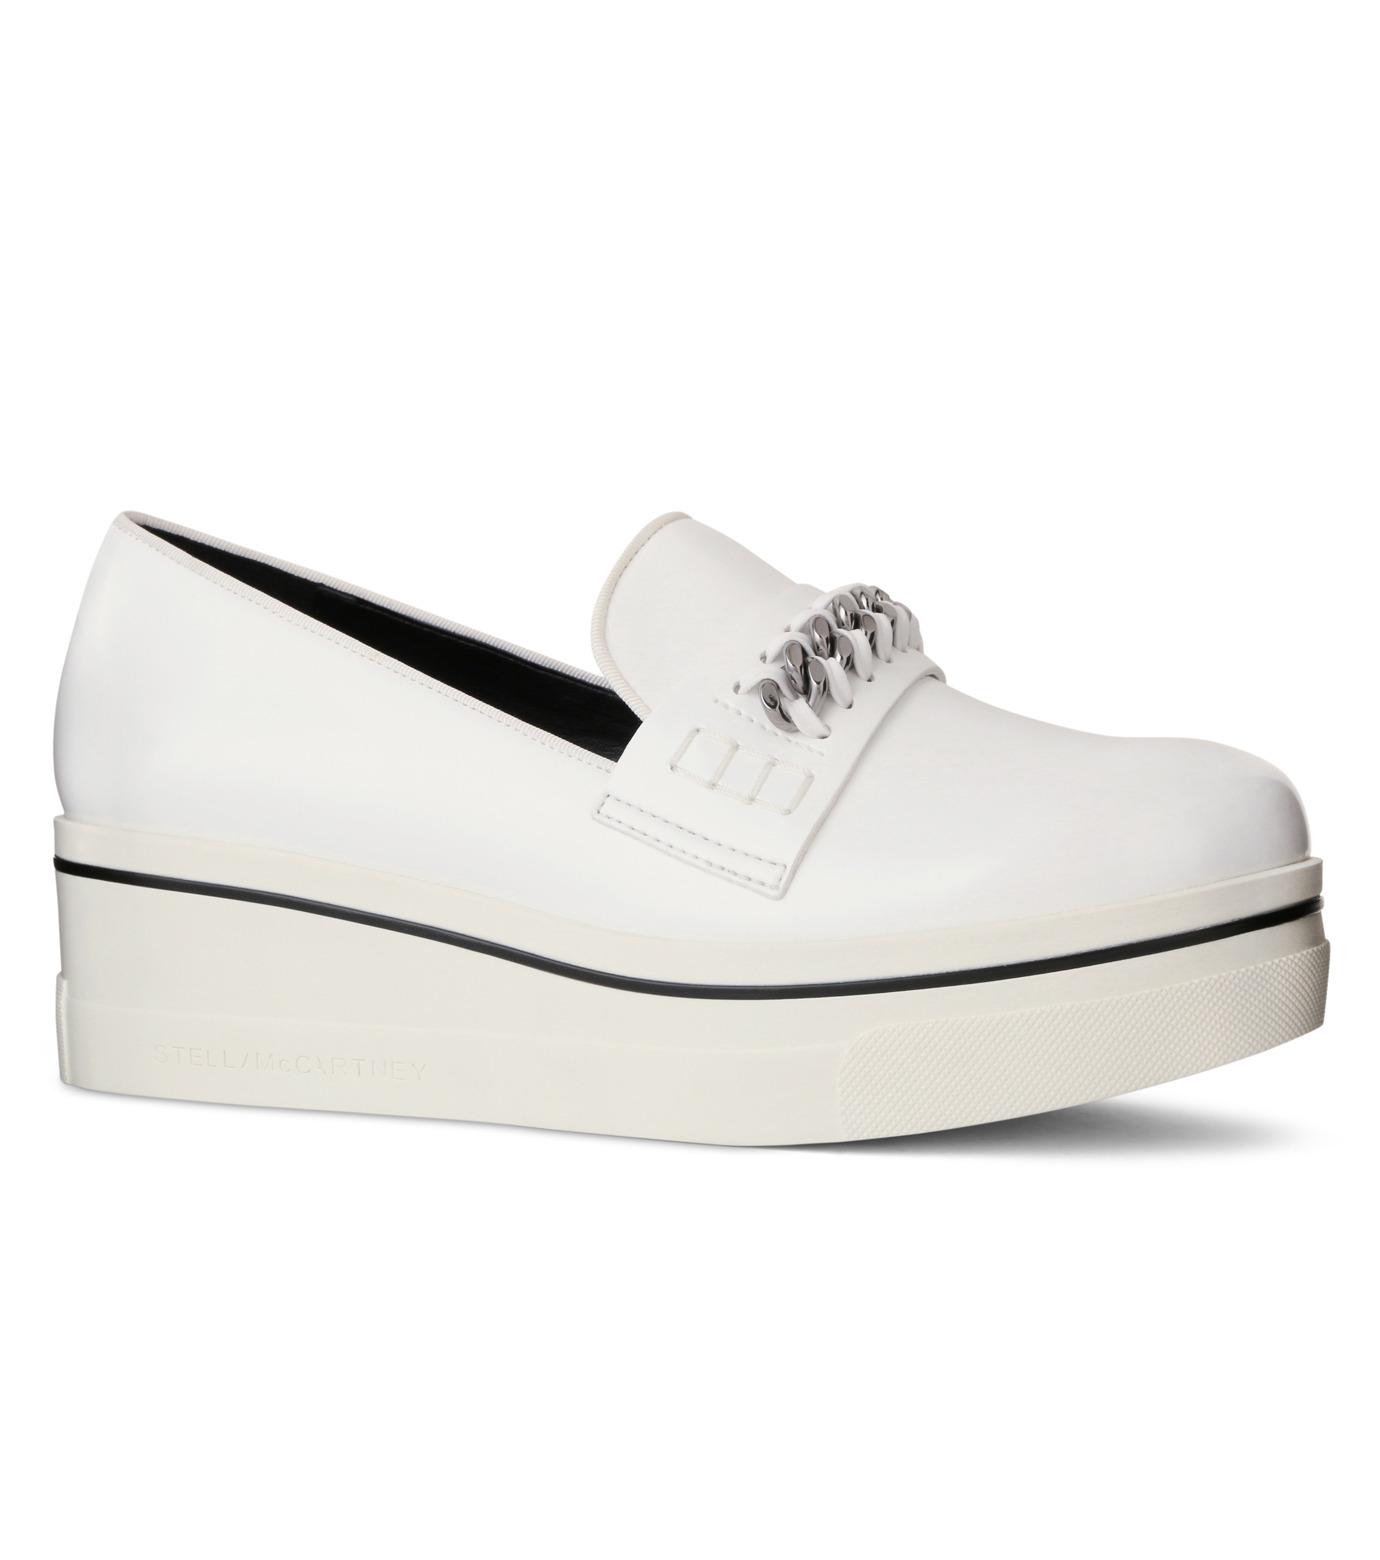 Stella McCartney(ステラマッカートニー)のBinx Sneaker-WHITE(スニーカー/sneaker)-392315-W0VE2-4 拡大詳細画像1